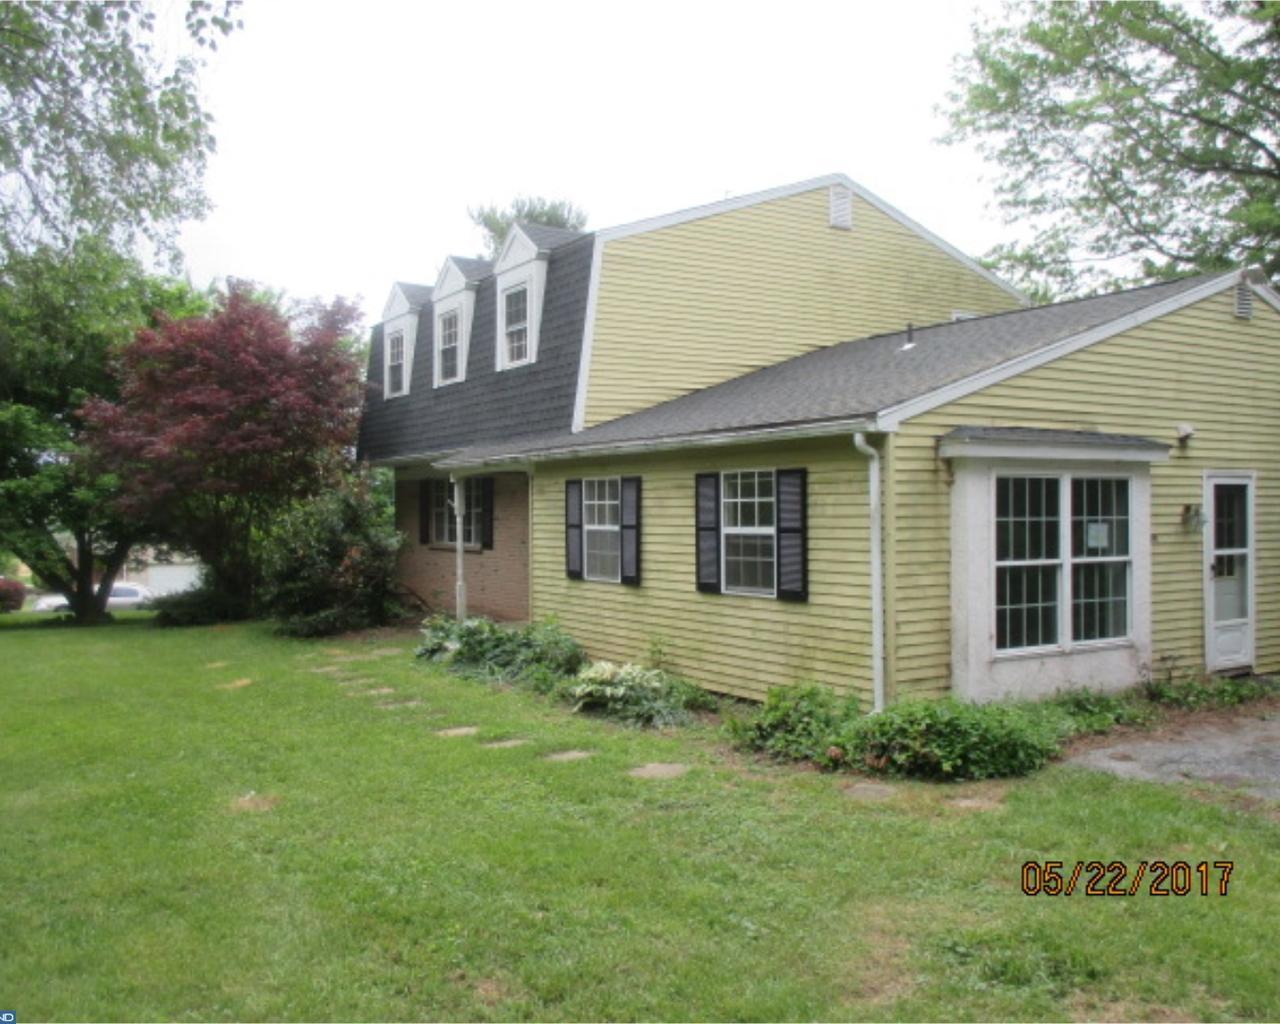 Property for sale at 220 BAKER RD, Cochranville,  PA 19330